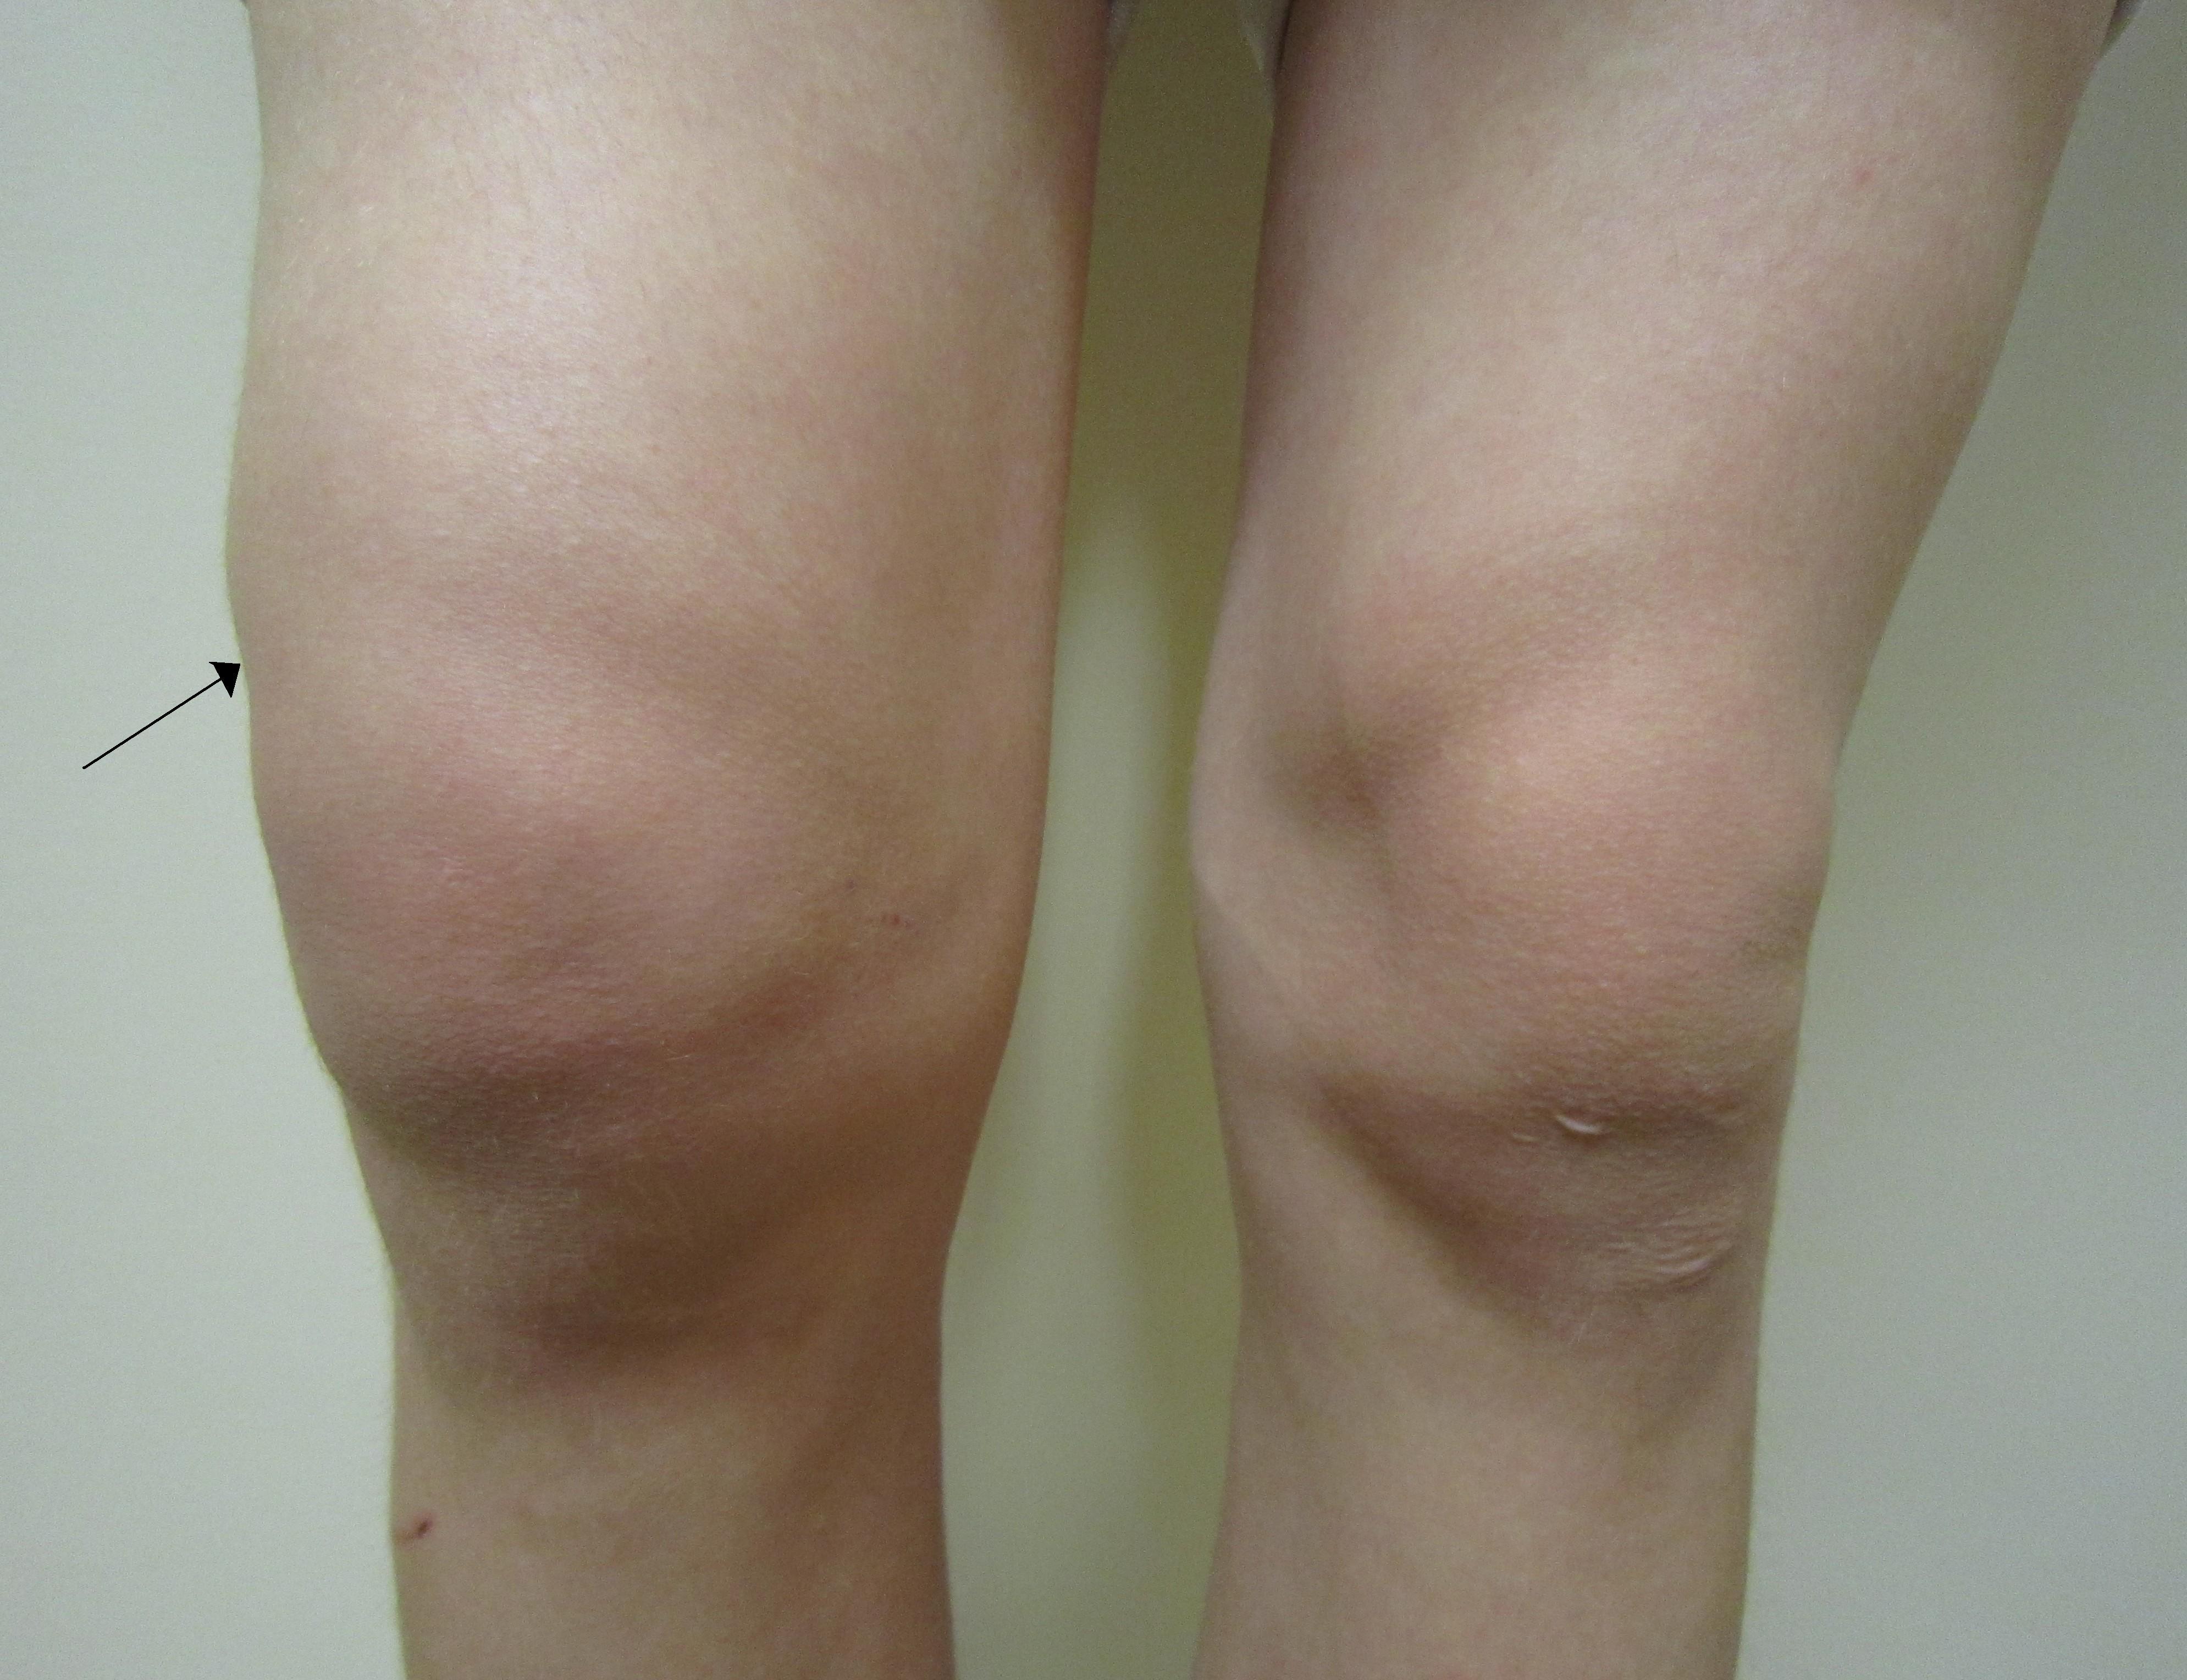 Apa la genunchi - Sănătate > Medicina generala - Pagina 1 - mysneakers.ro